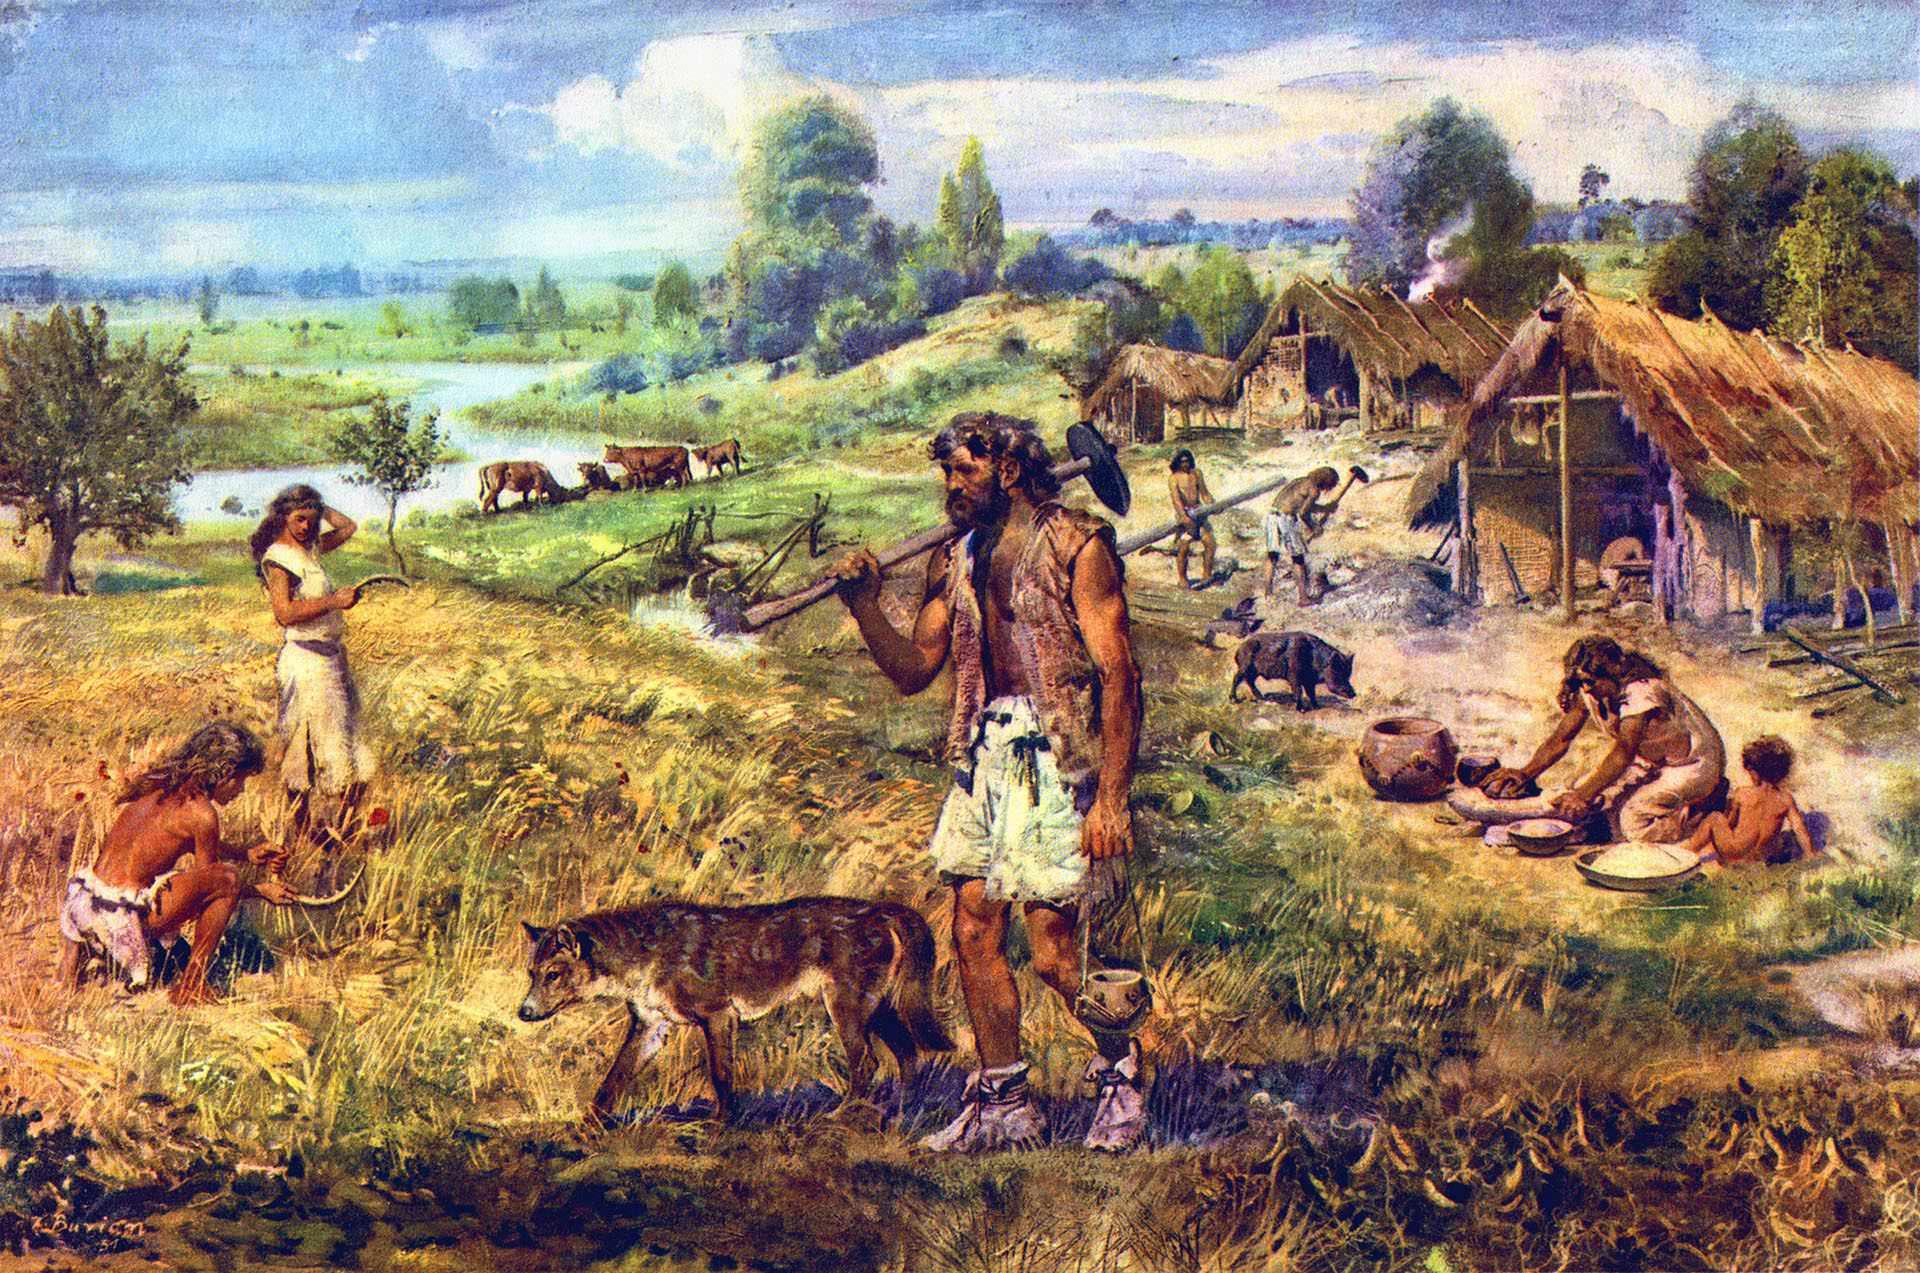 paleolithic keto diet mydietgoal hd